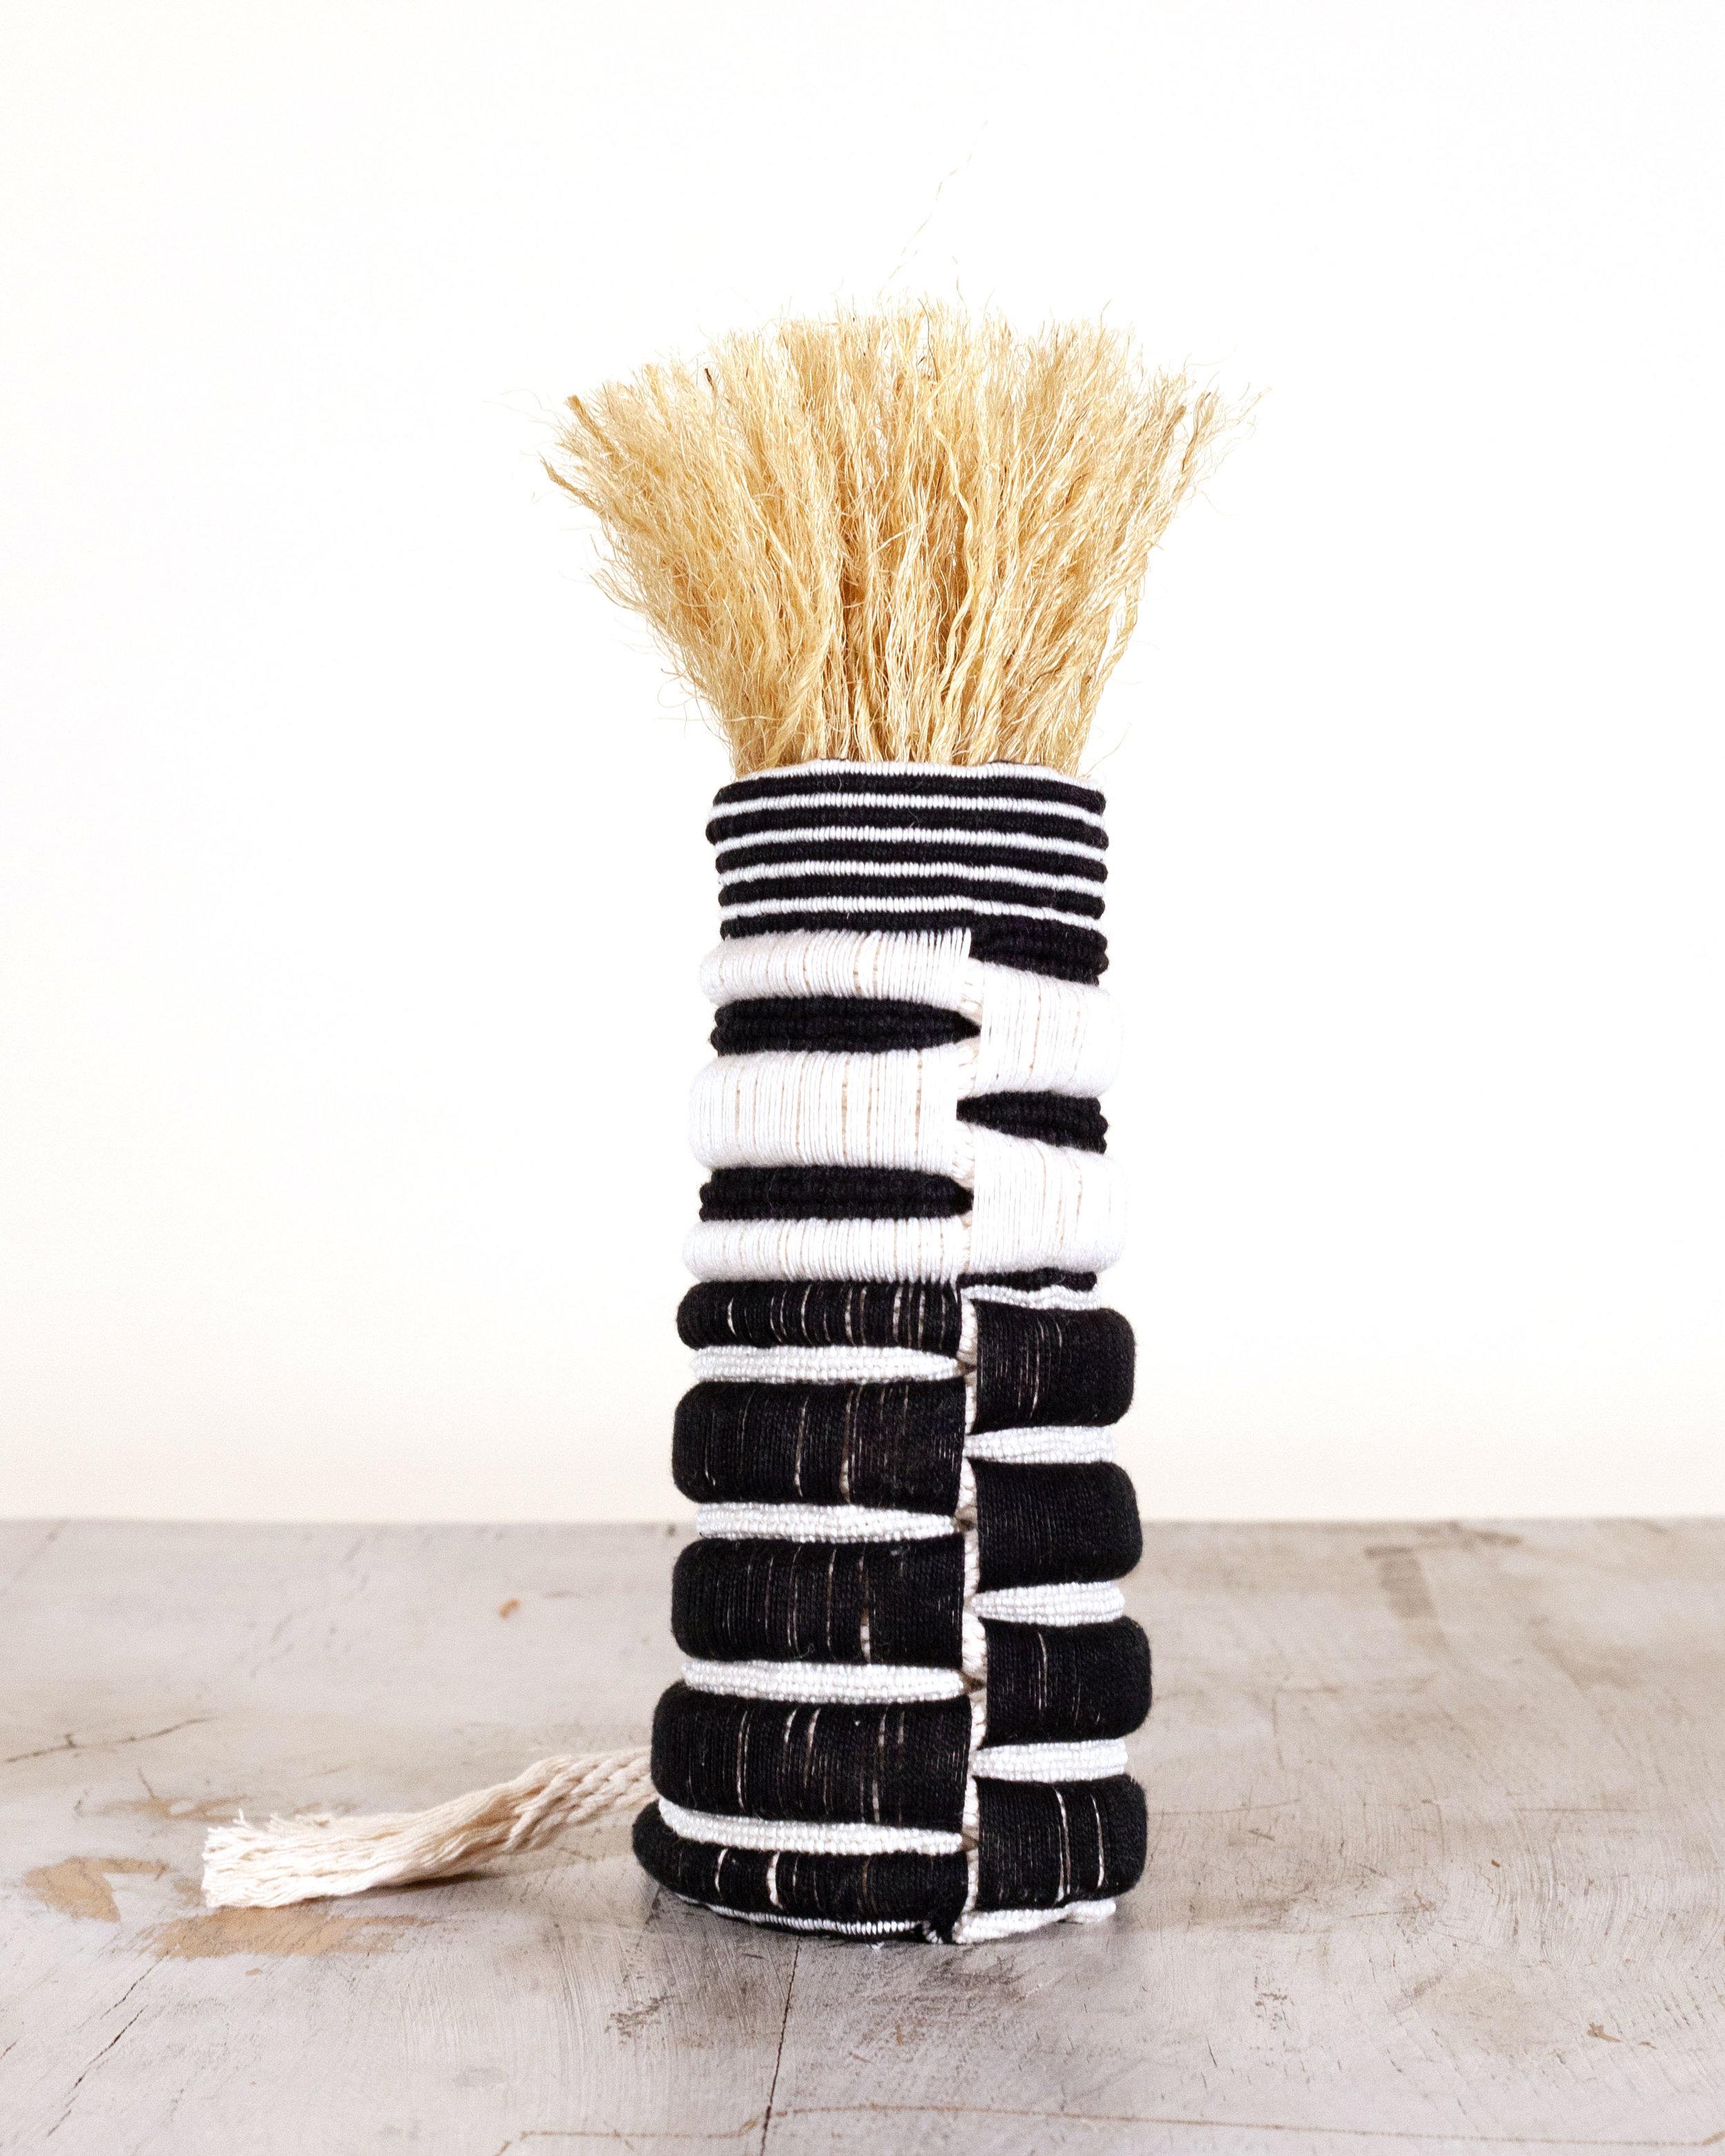 Vase3front.jpg